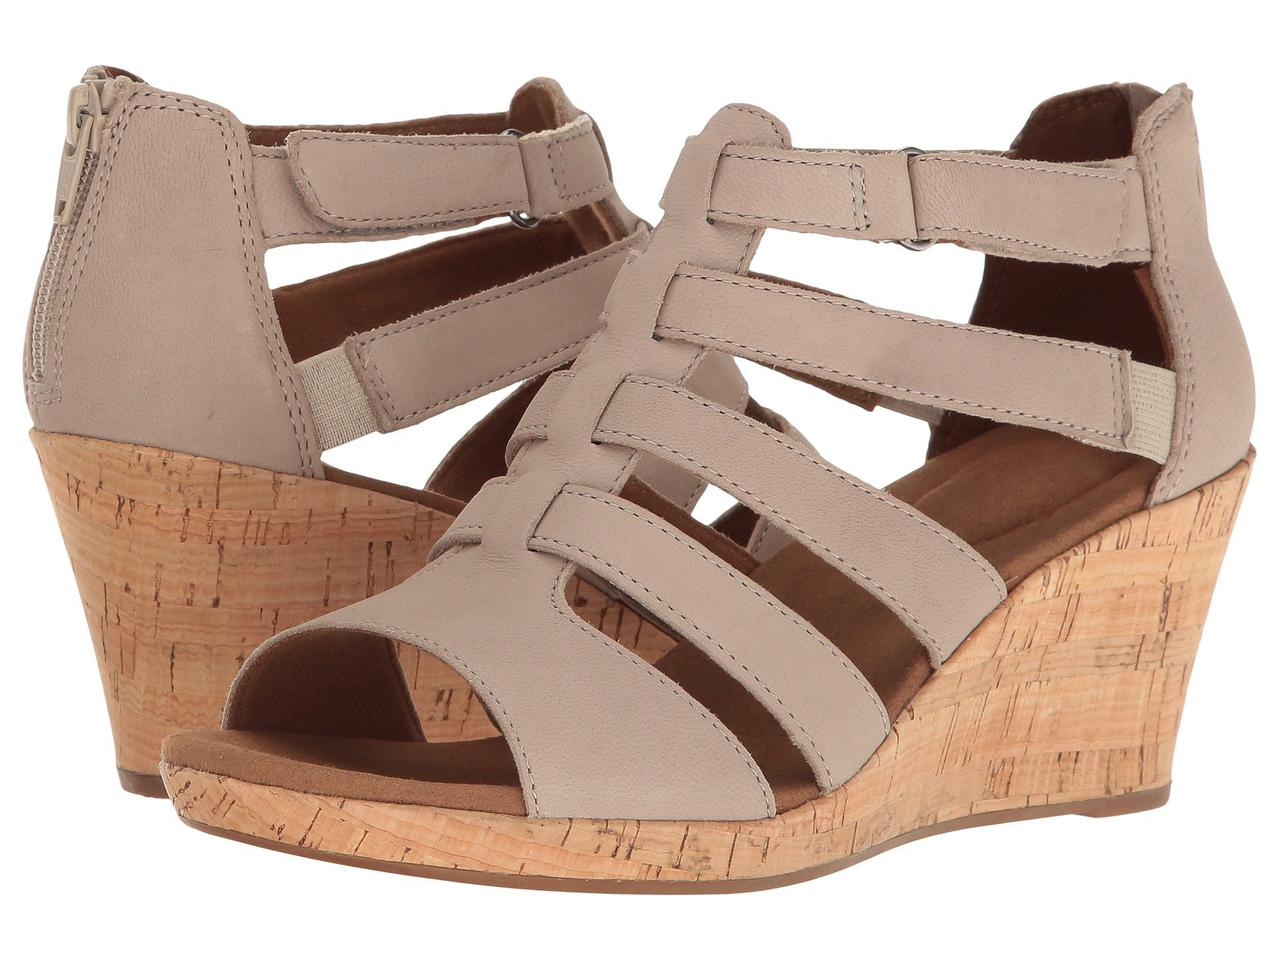 df3981ce567d Туфли на каблуке (Оригинал) Rockport Briah Gladiator New Taupe Nubuck -  TopUSA